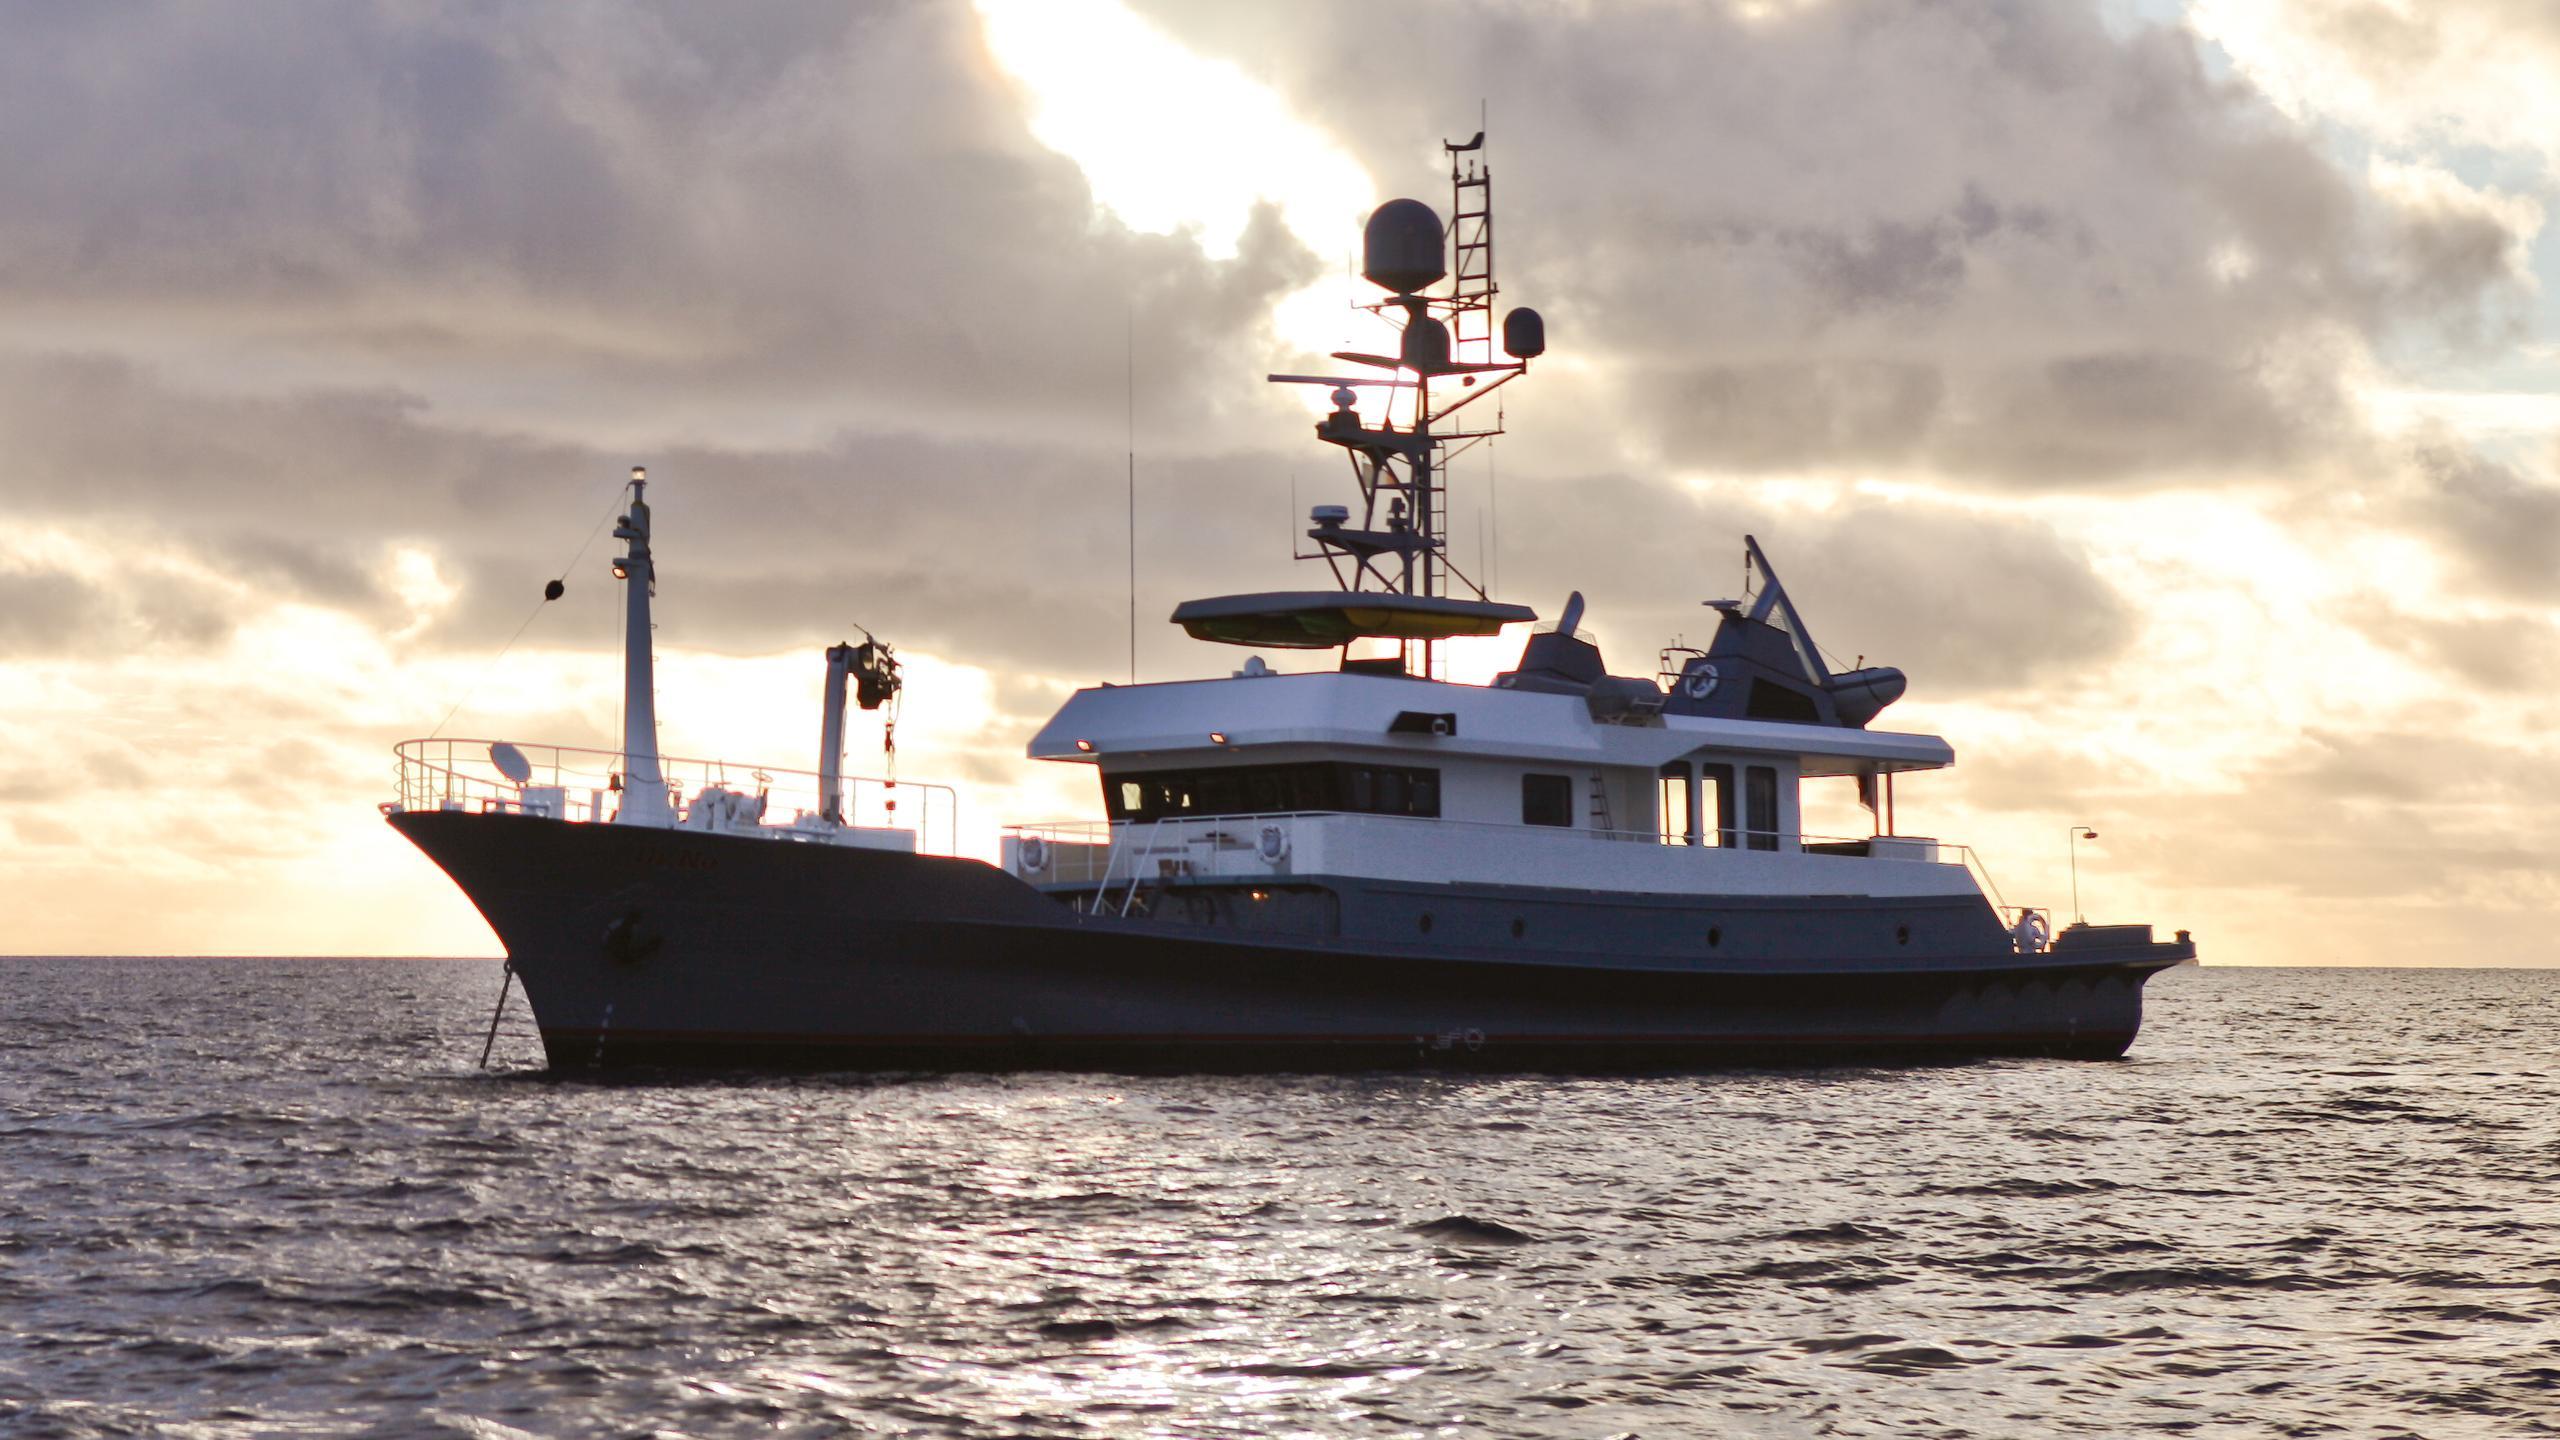 dr-no-explorer-yacht-narasaki-1995-37m-sunset